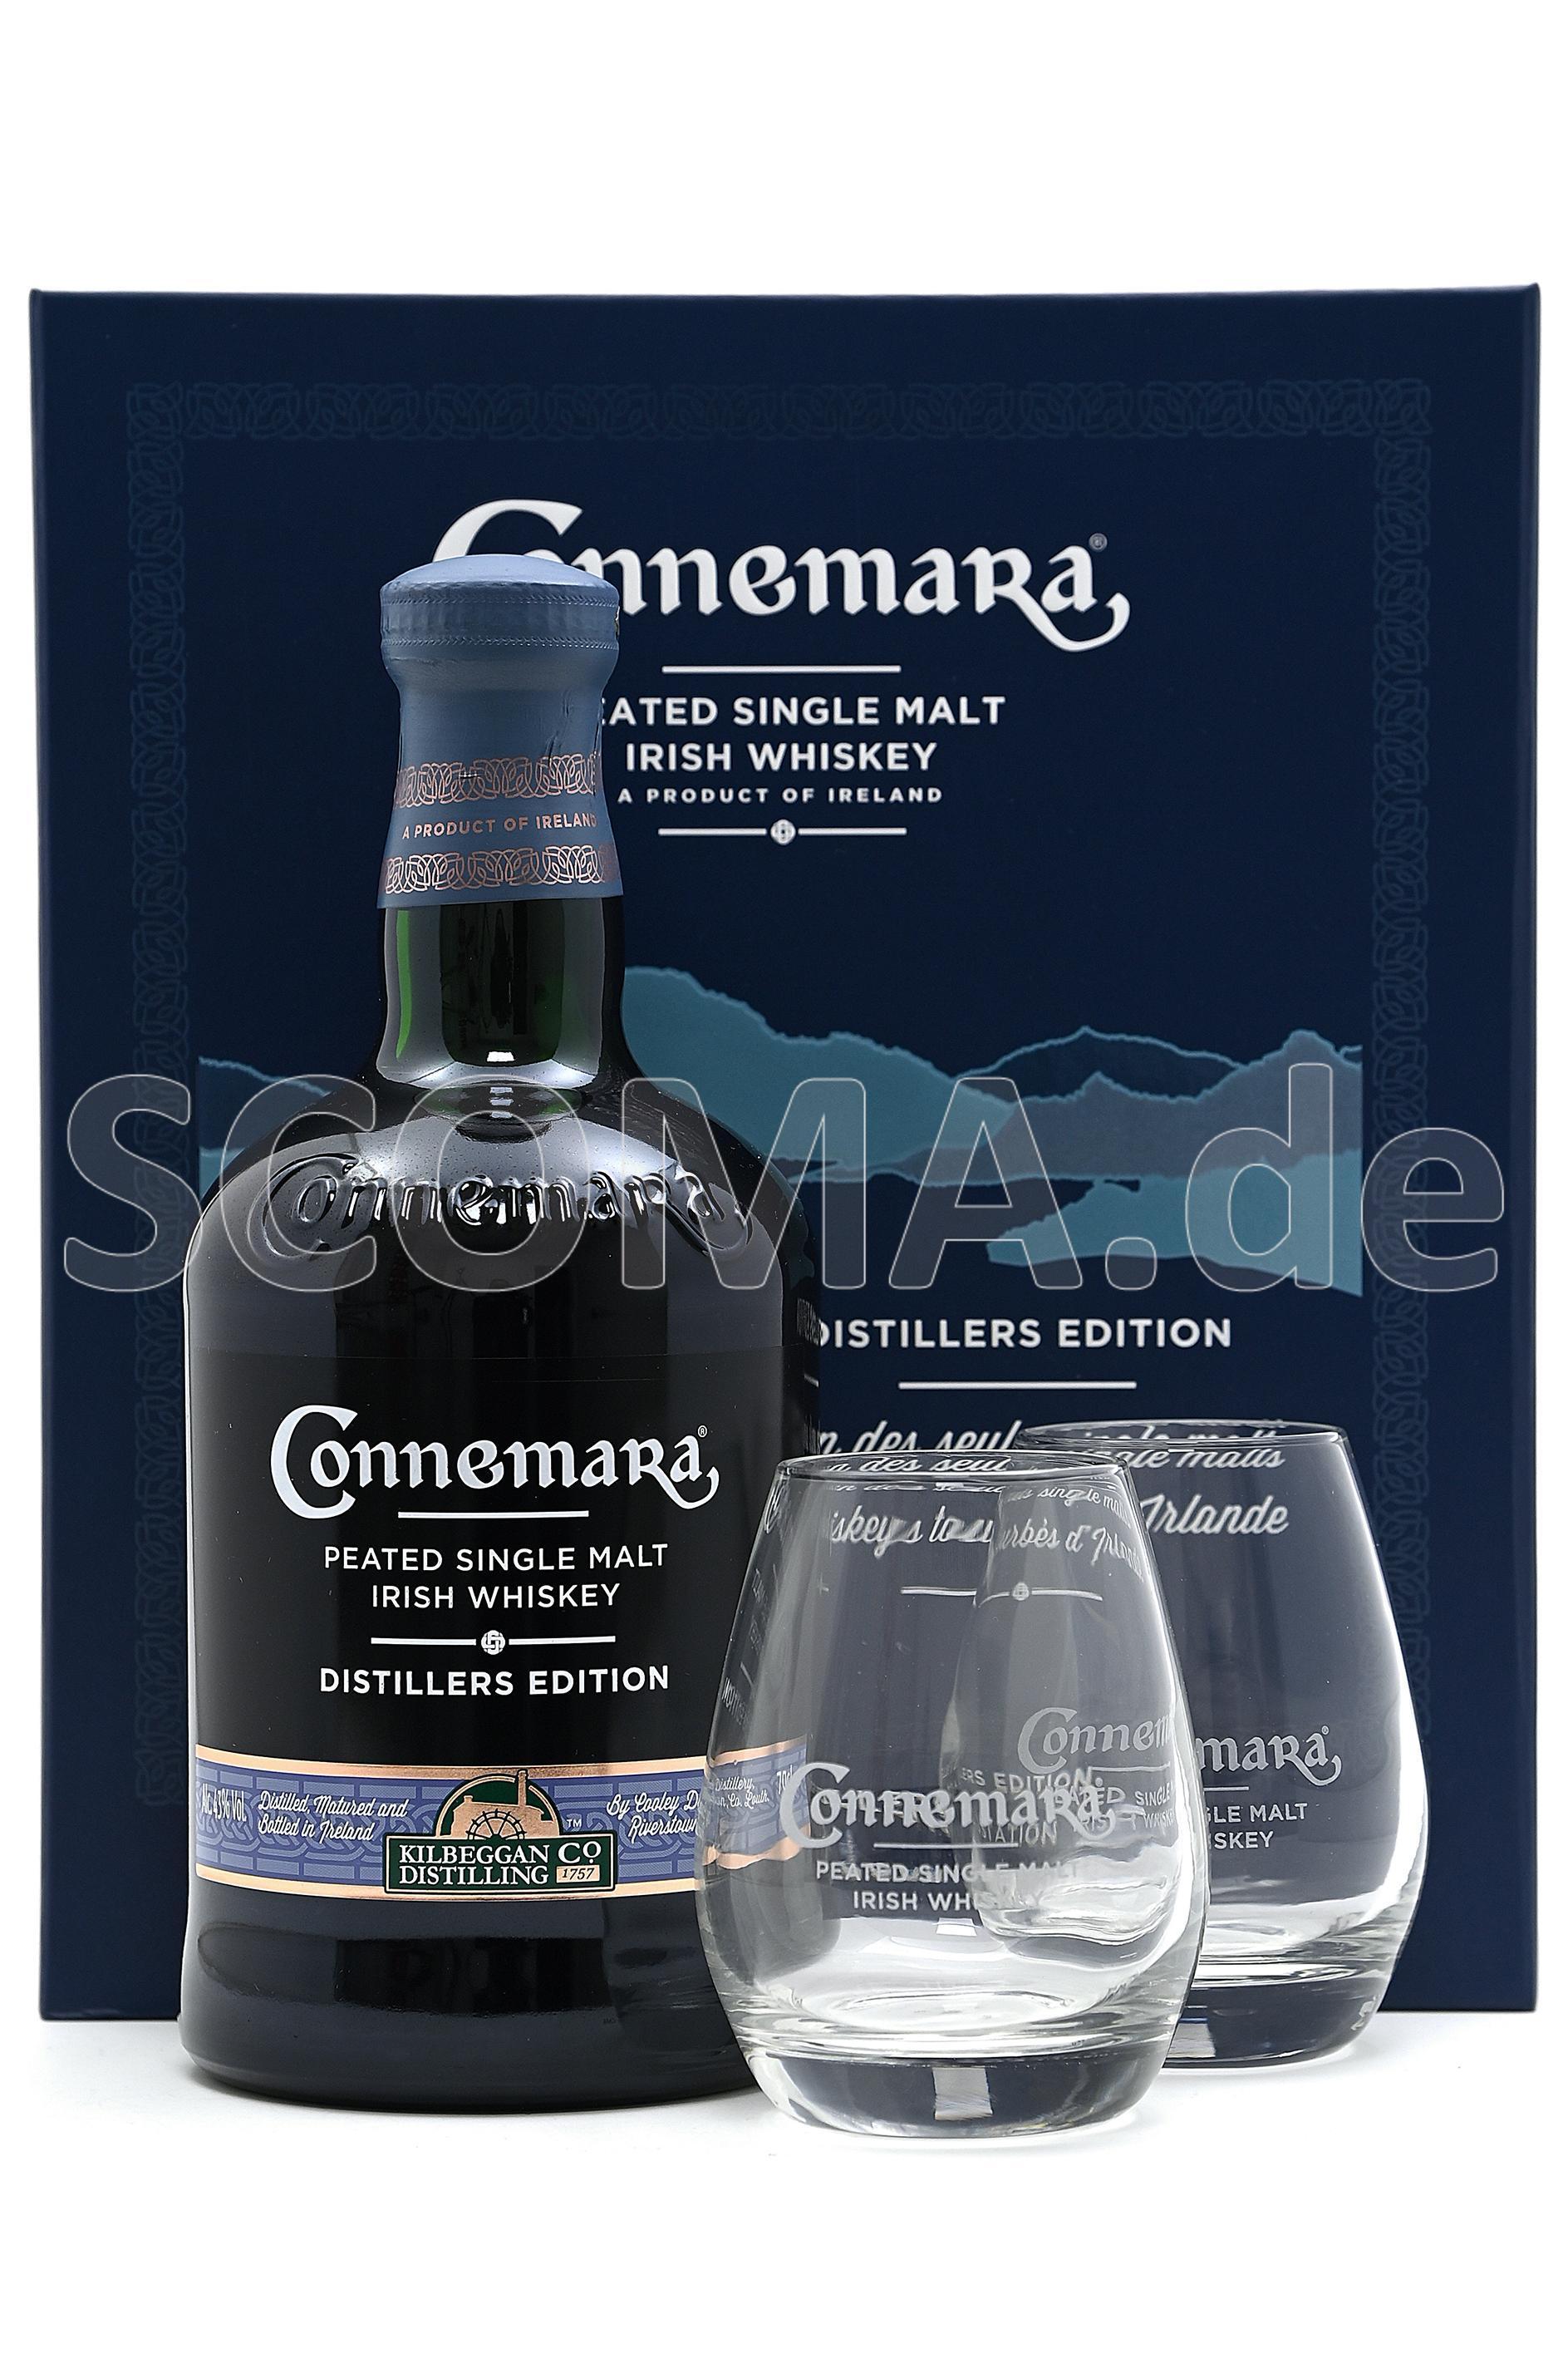 Connemara Distillers Edition m...